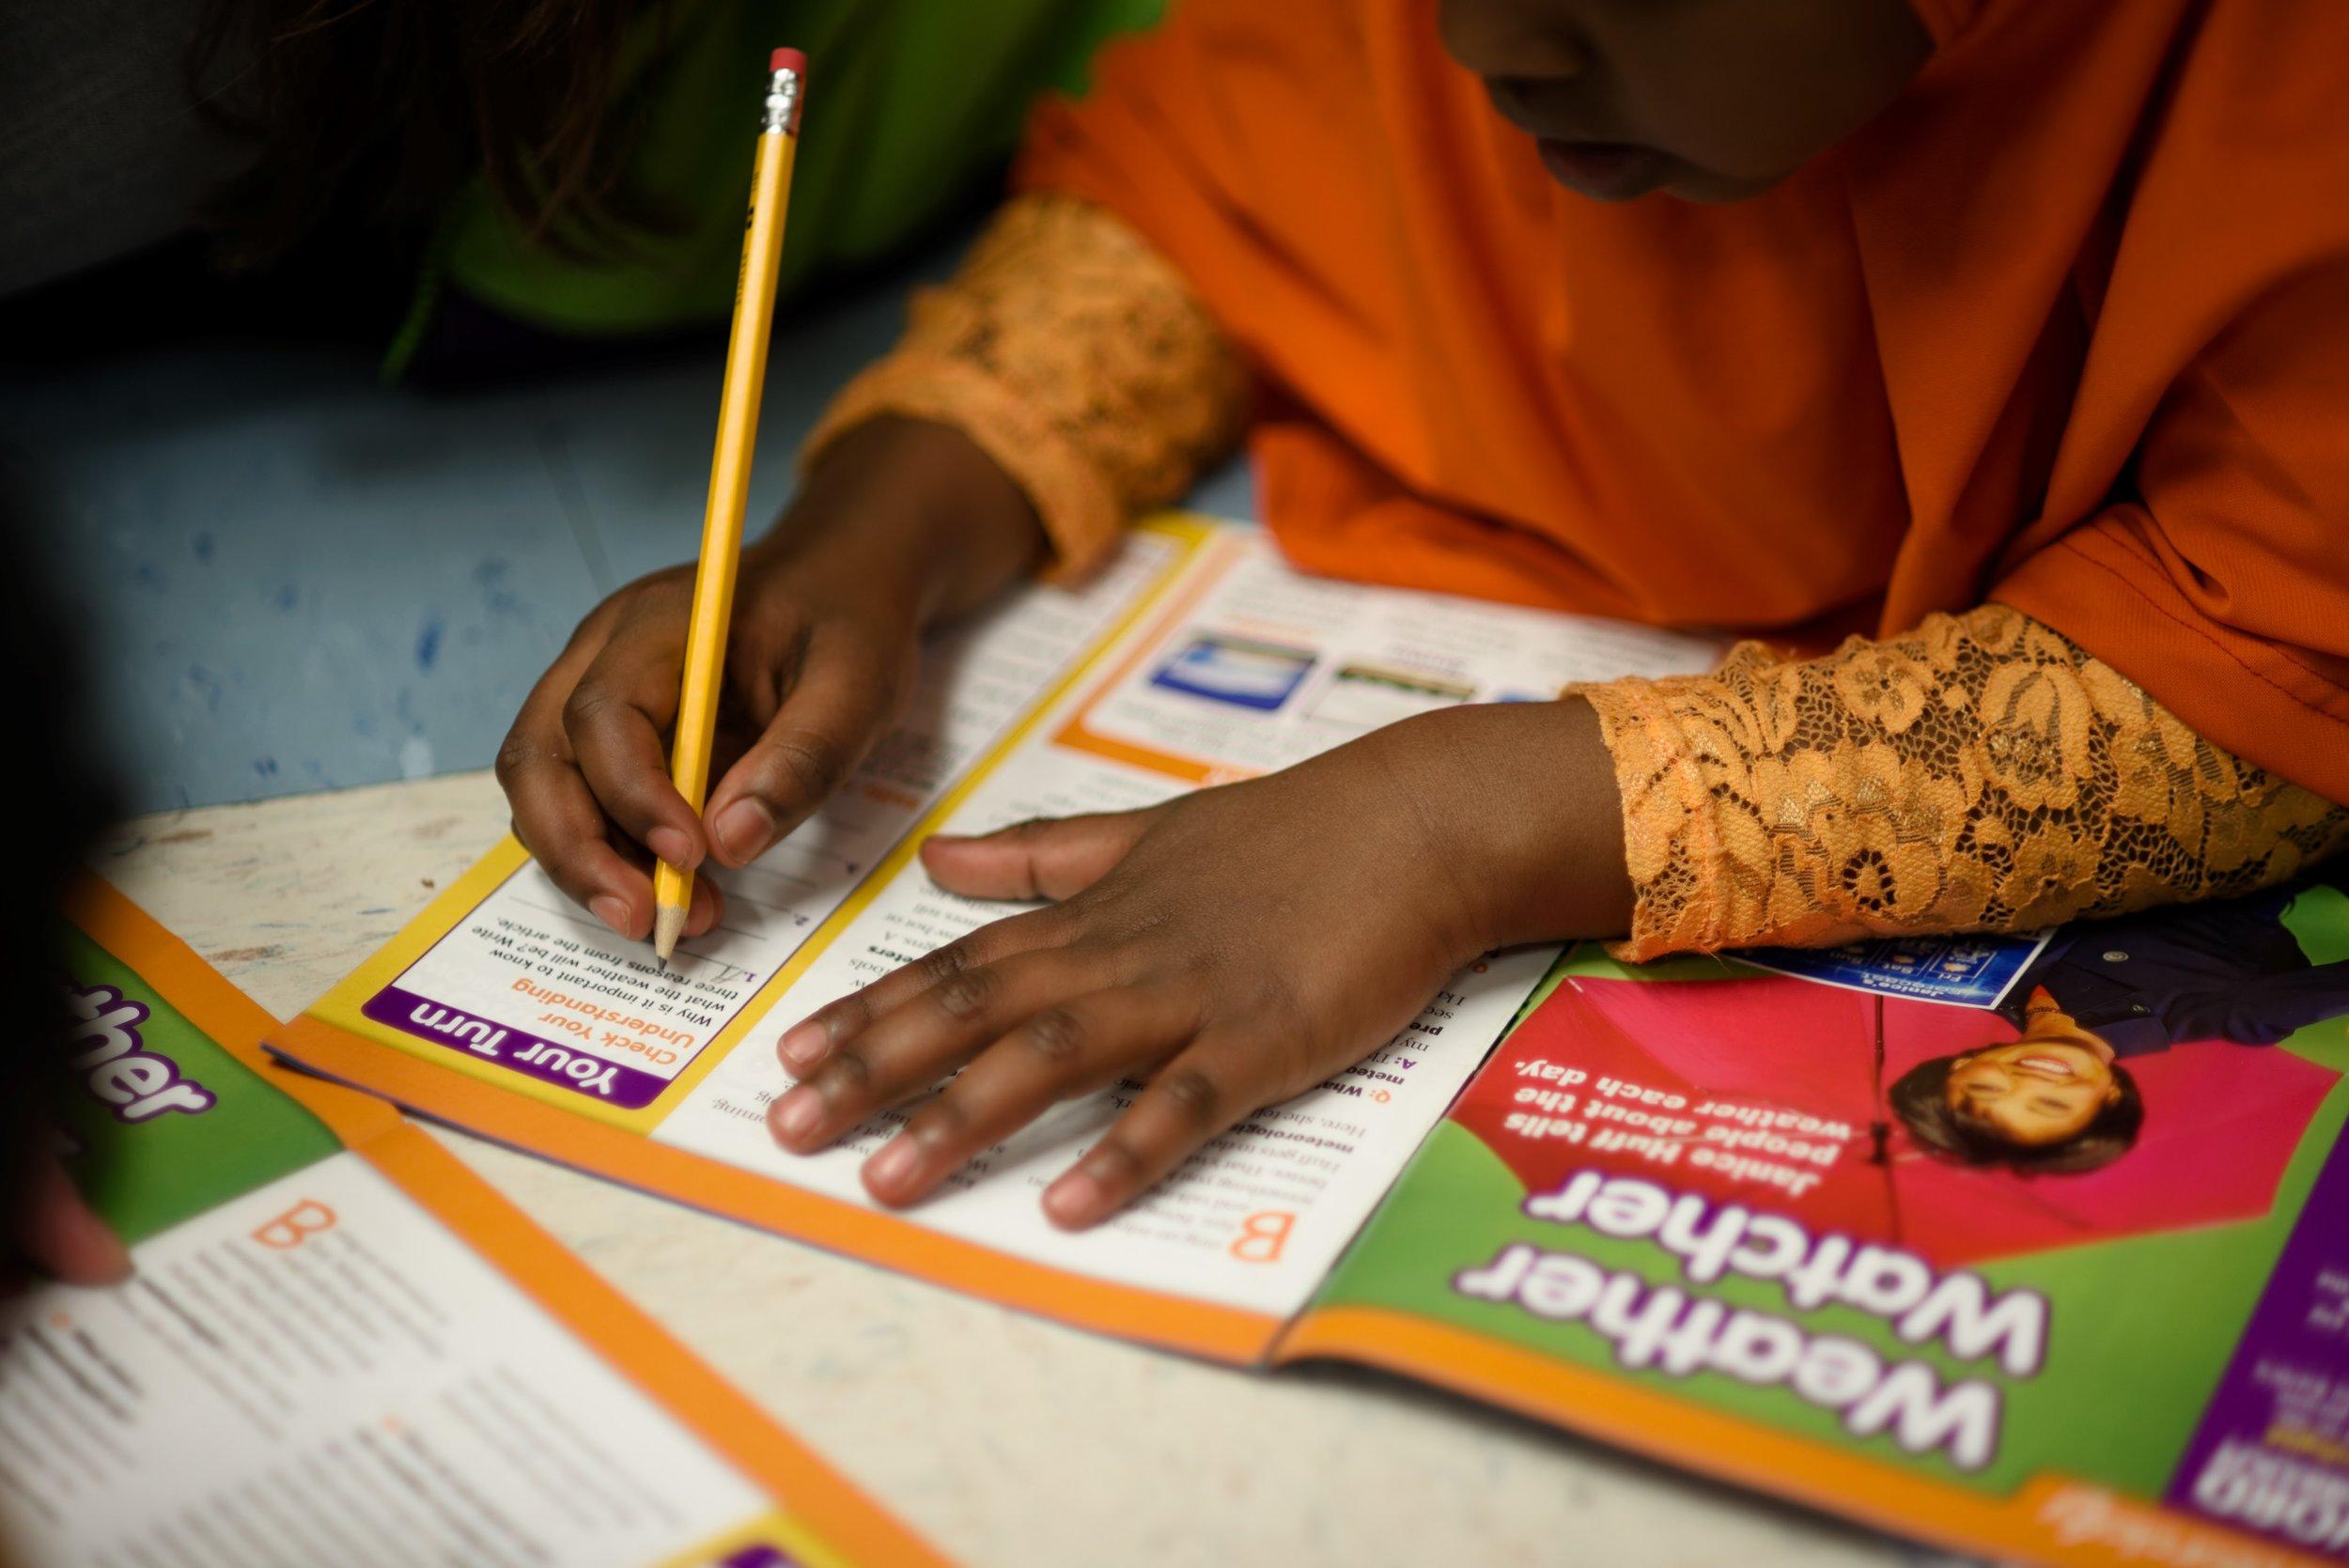 Elementary - Community Based Programs